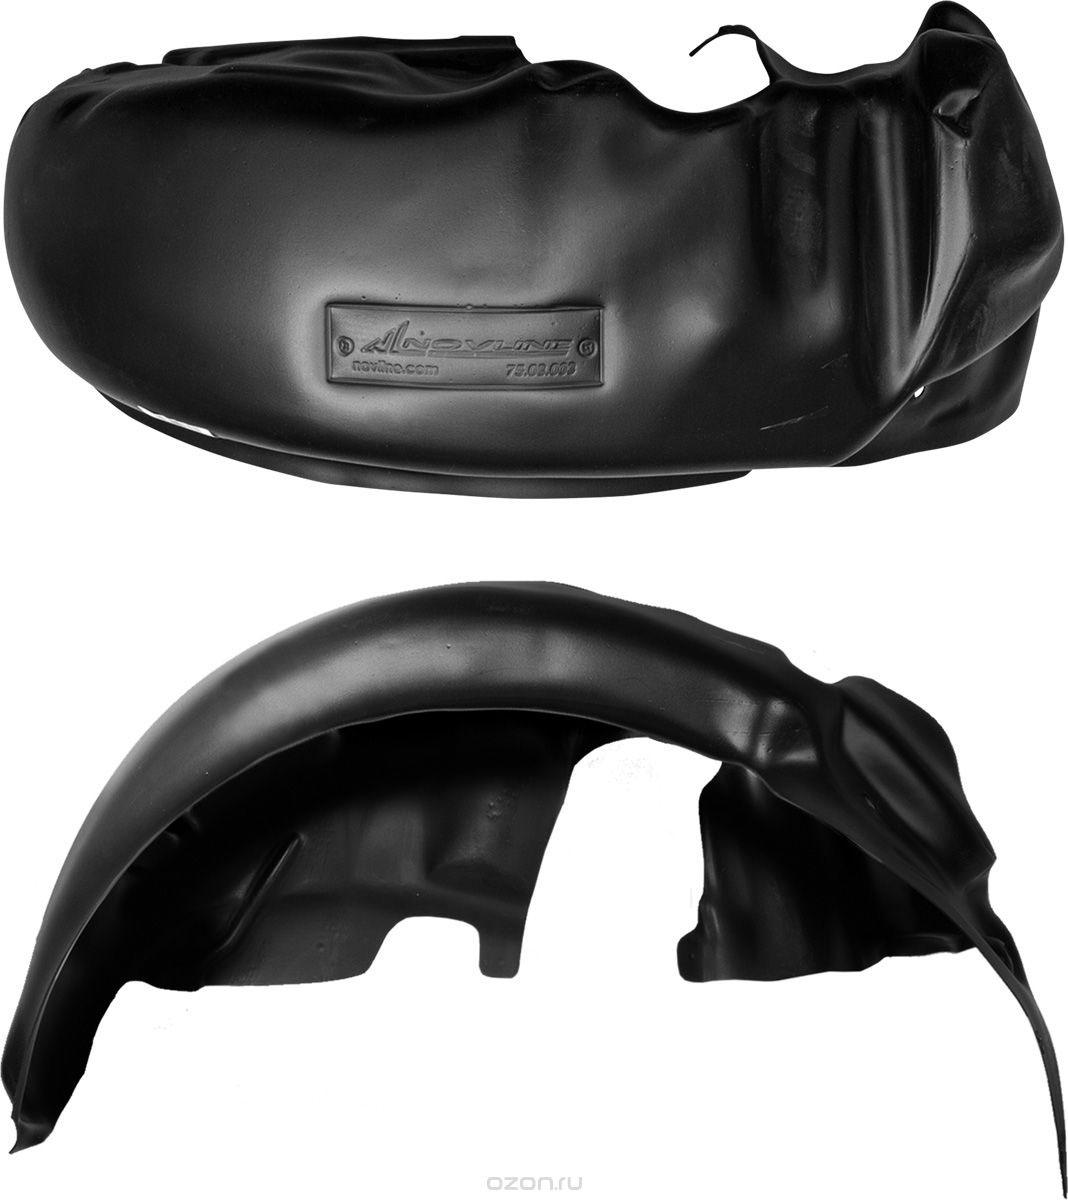 Подкрылок Totem, для Toyota LC150, 2009-2013, 2013-2015, 2015->, внедорожник, передний правый подкрылок totem toyota venza 2013